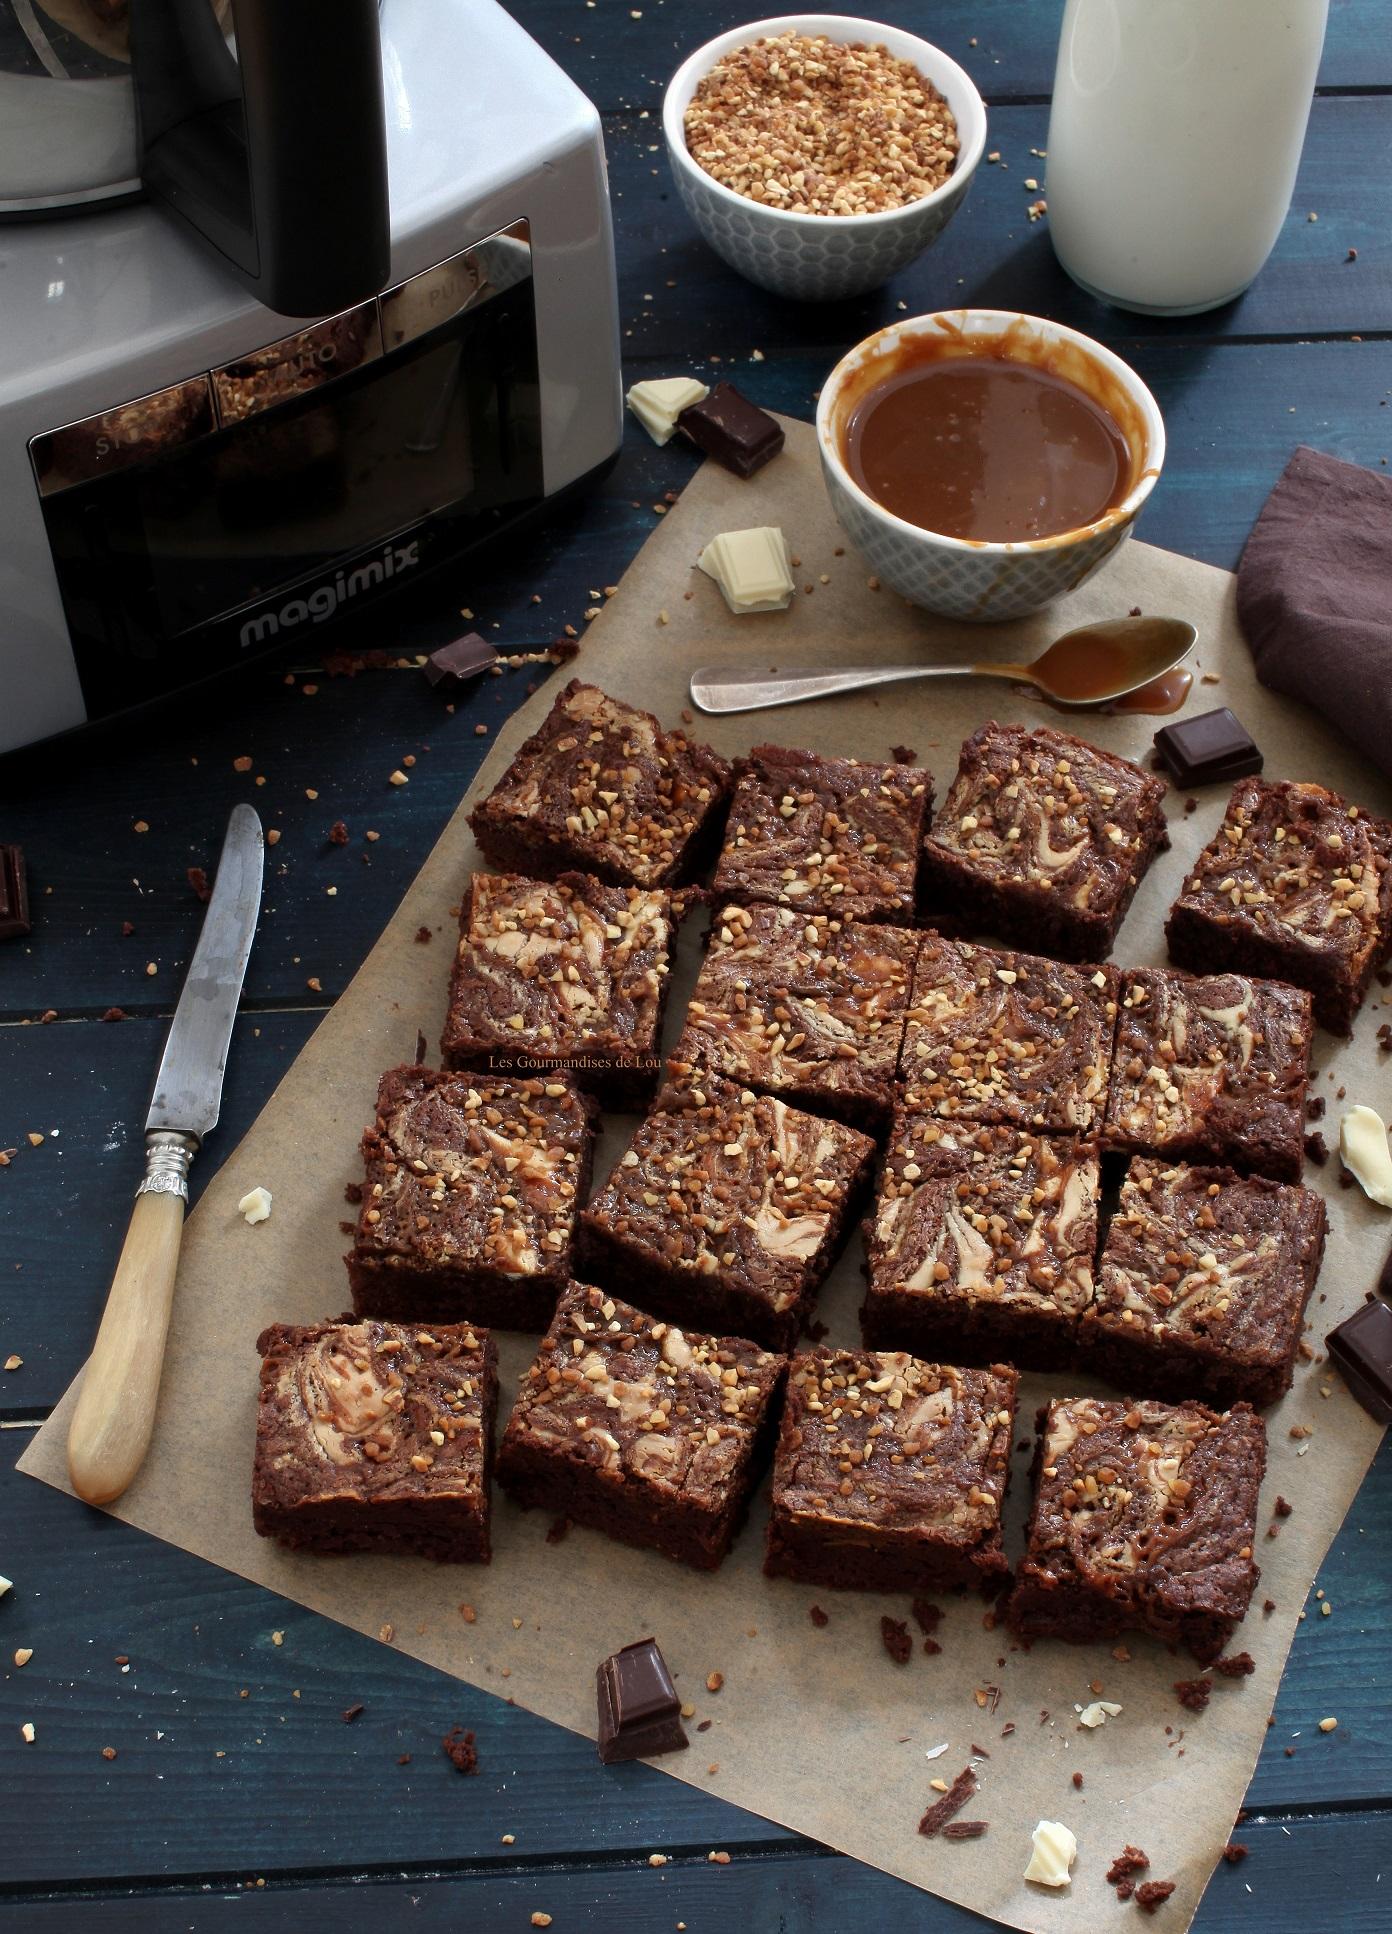 brownie-au-chocolat-caramel-au-beurre-sale-et-pralin